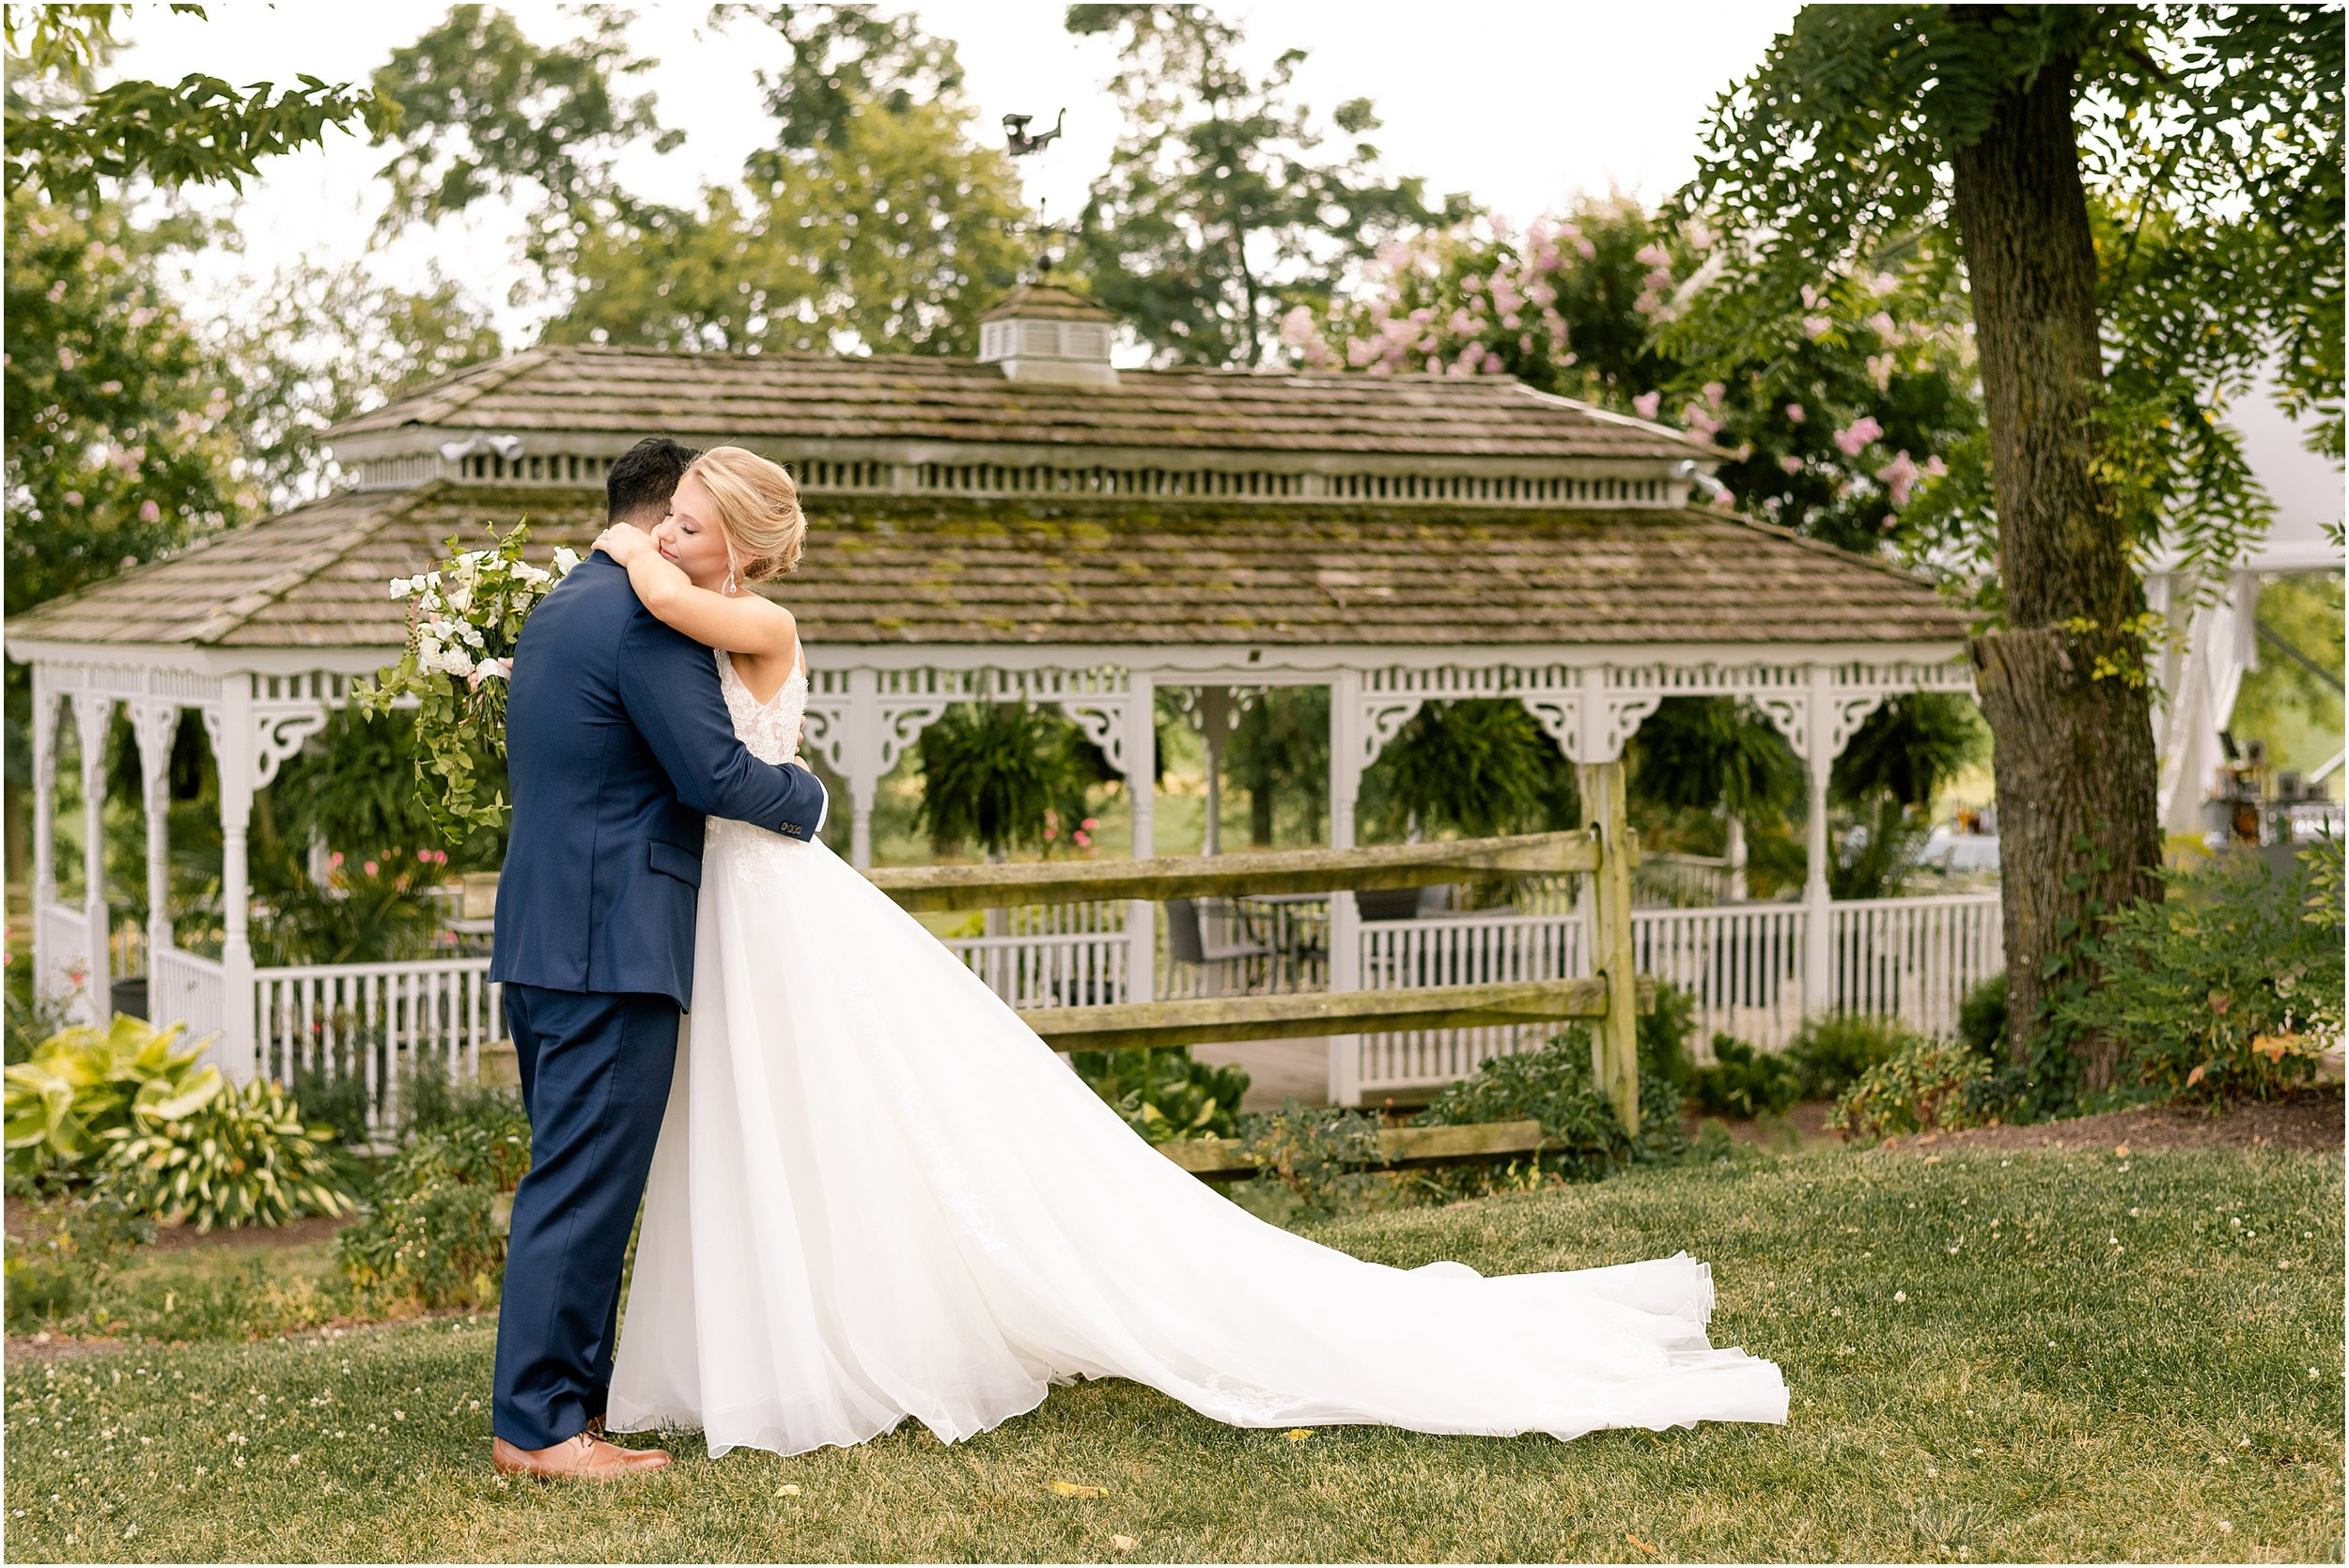 hannah leigh photography Walkers Overlook Wedding Walkersville MD_3500.jpg